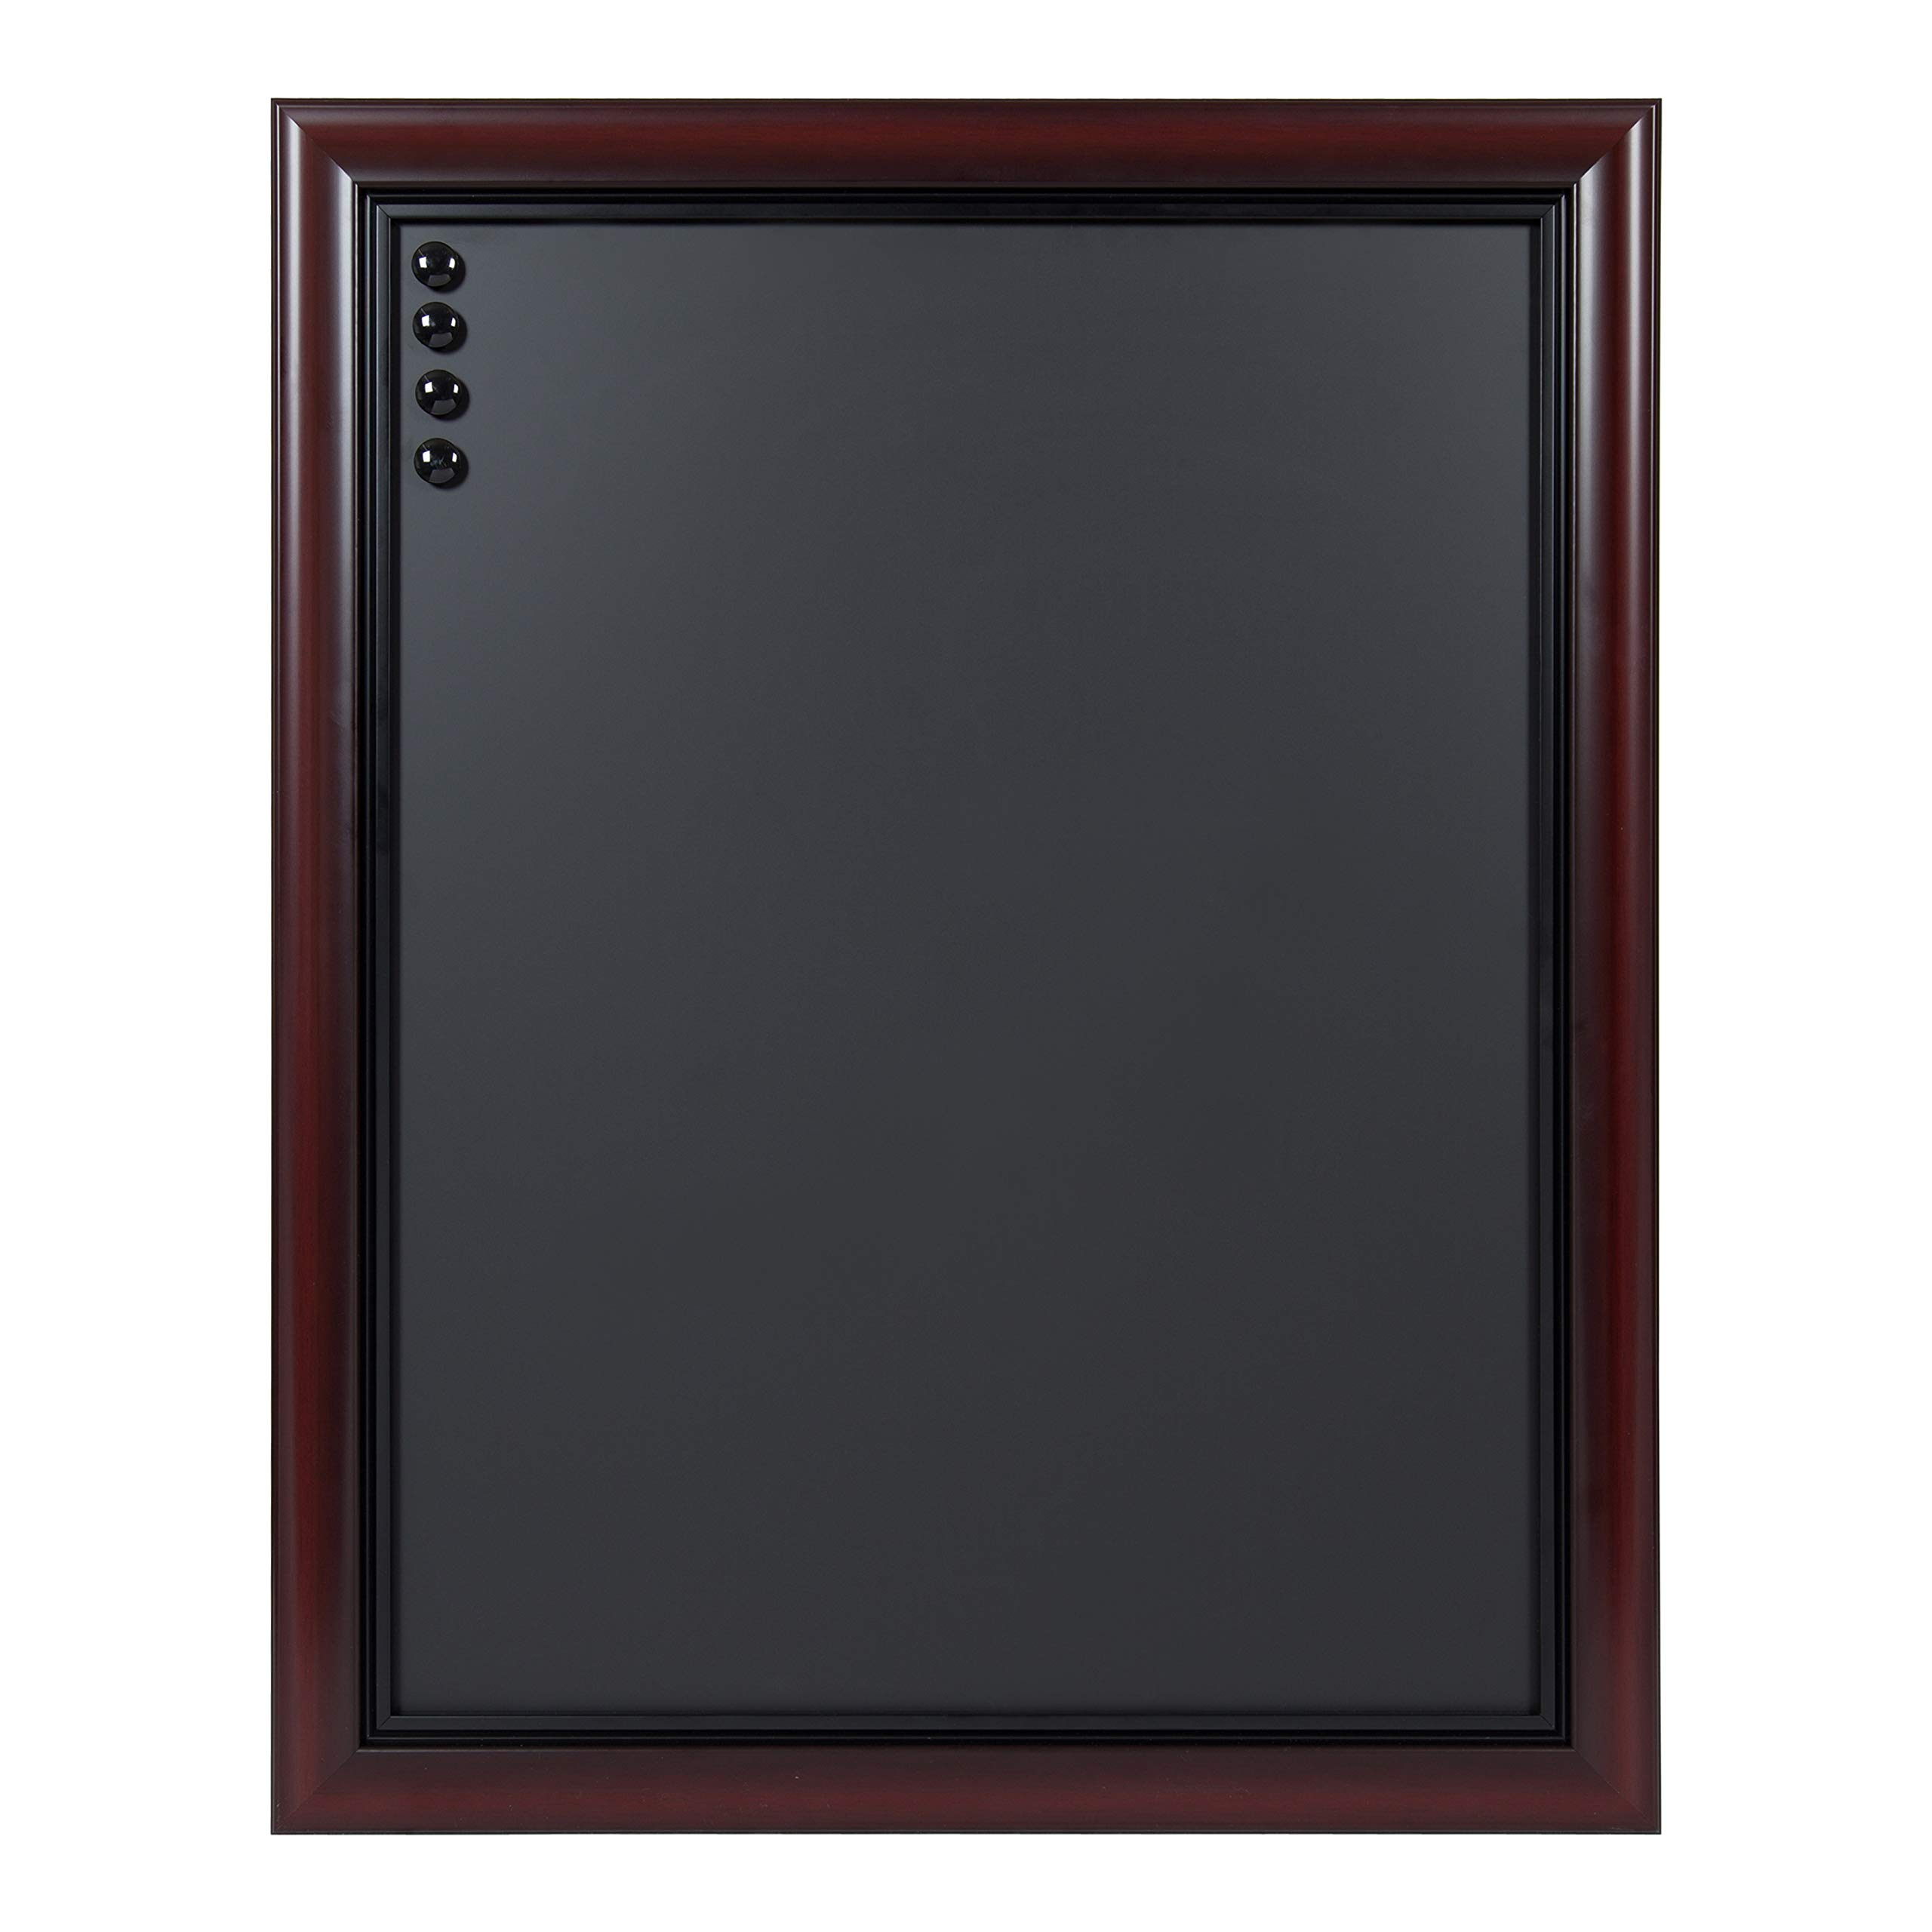 DesignOvation Dandridge Framed Magnetic Chalkboard, 24x30, Cherry by Kate and Laurel